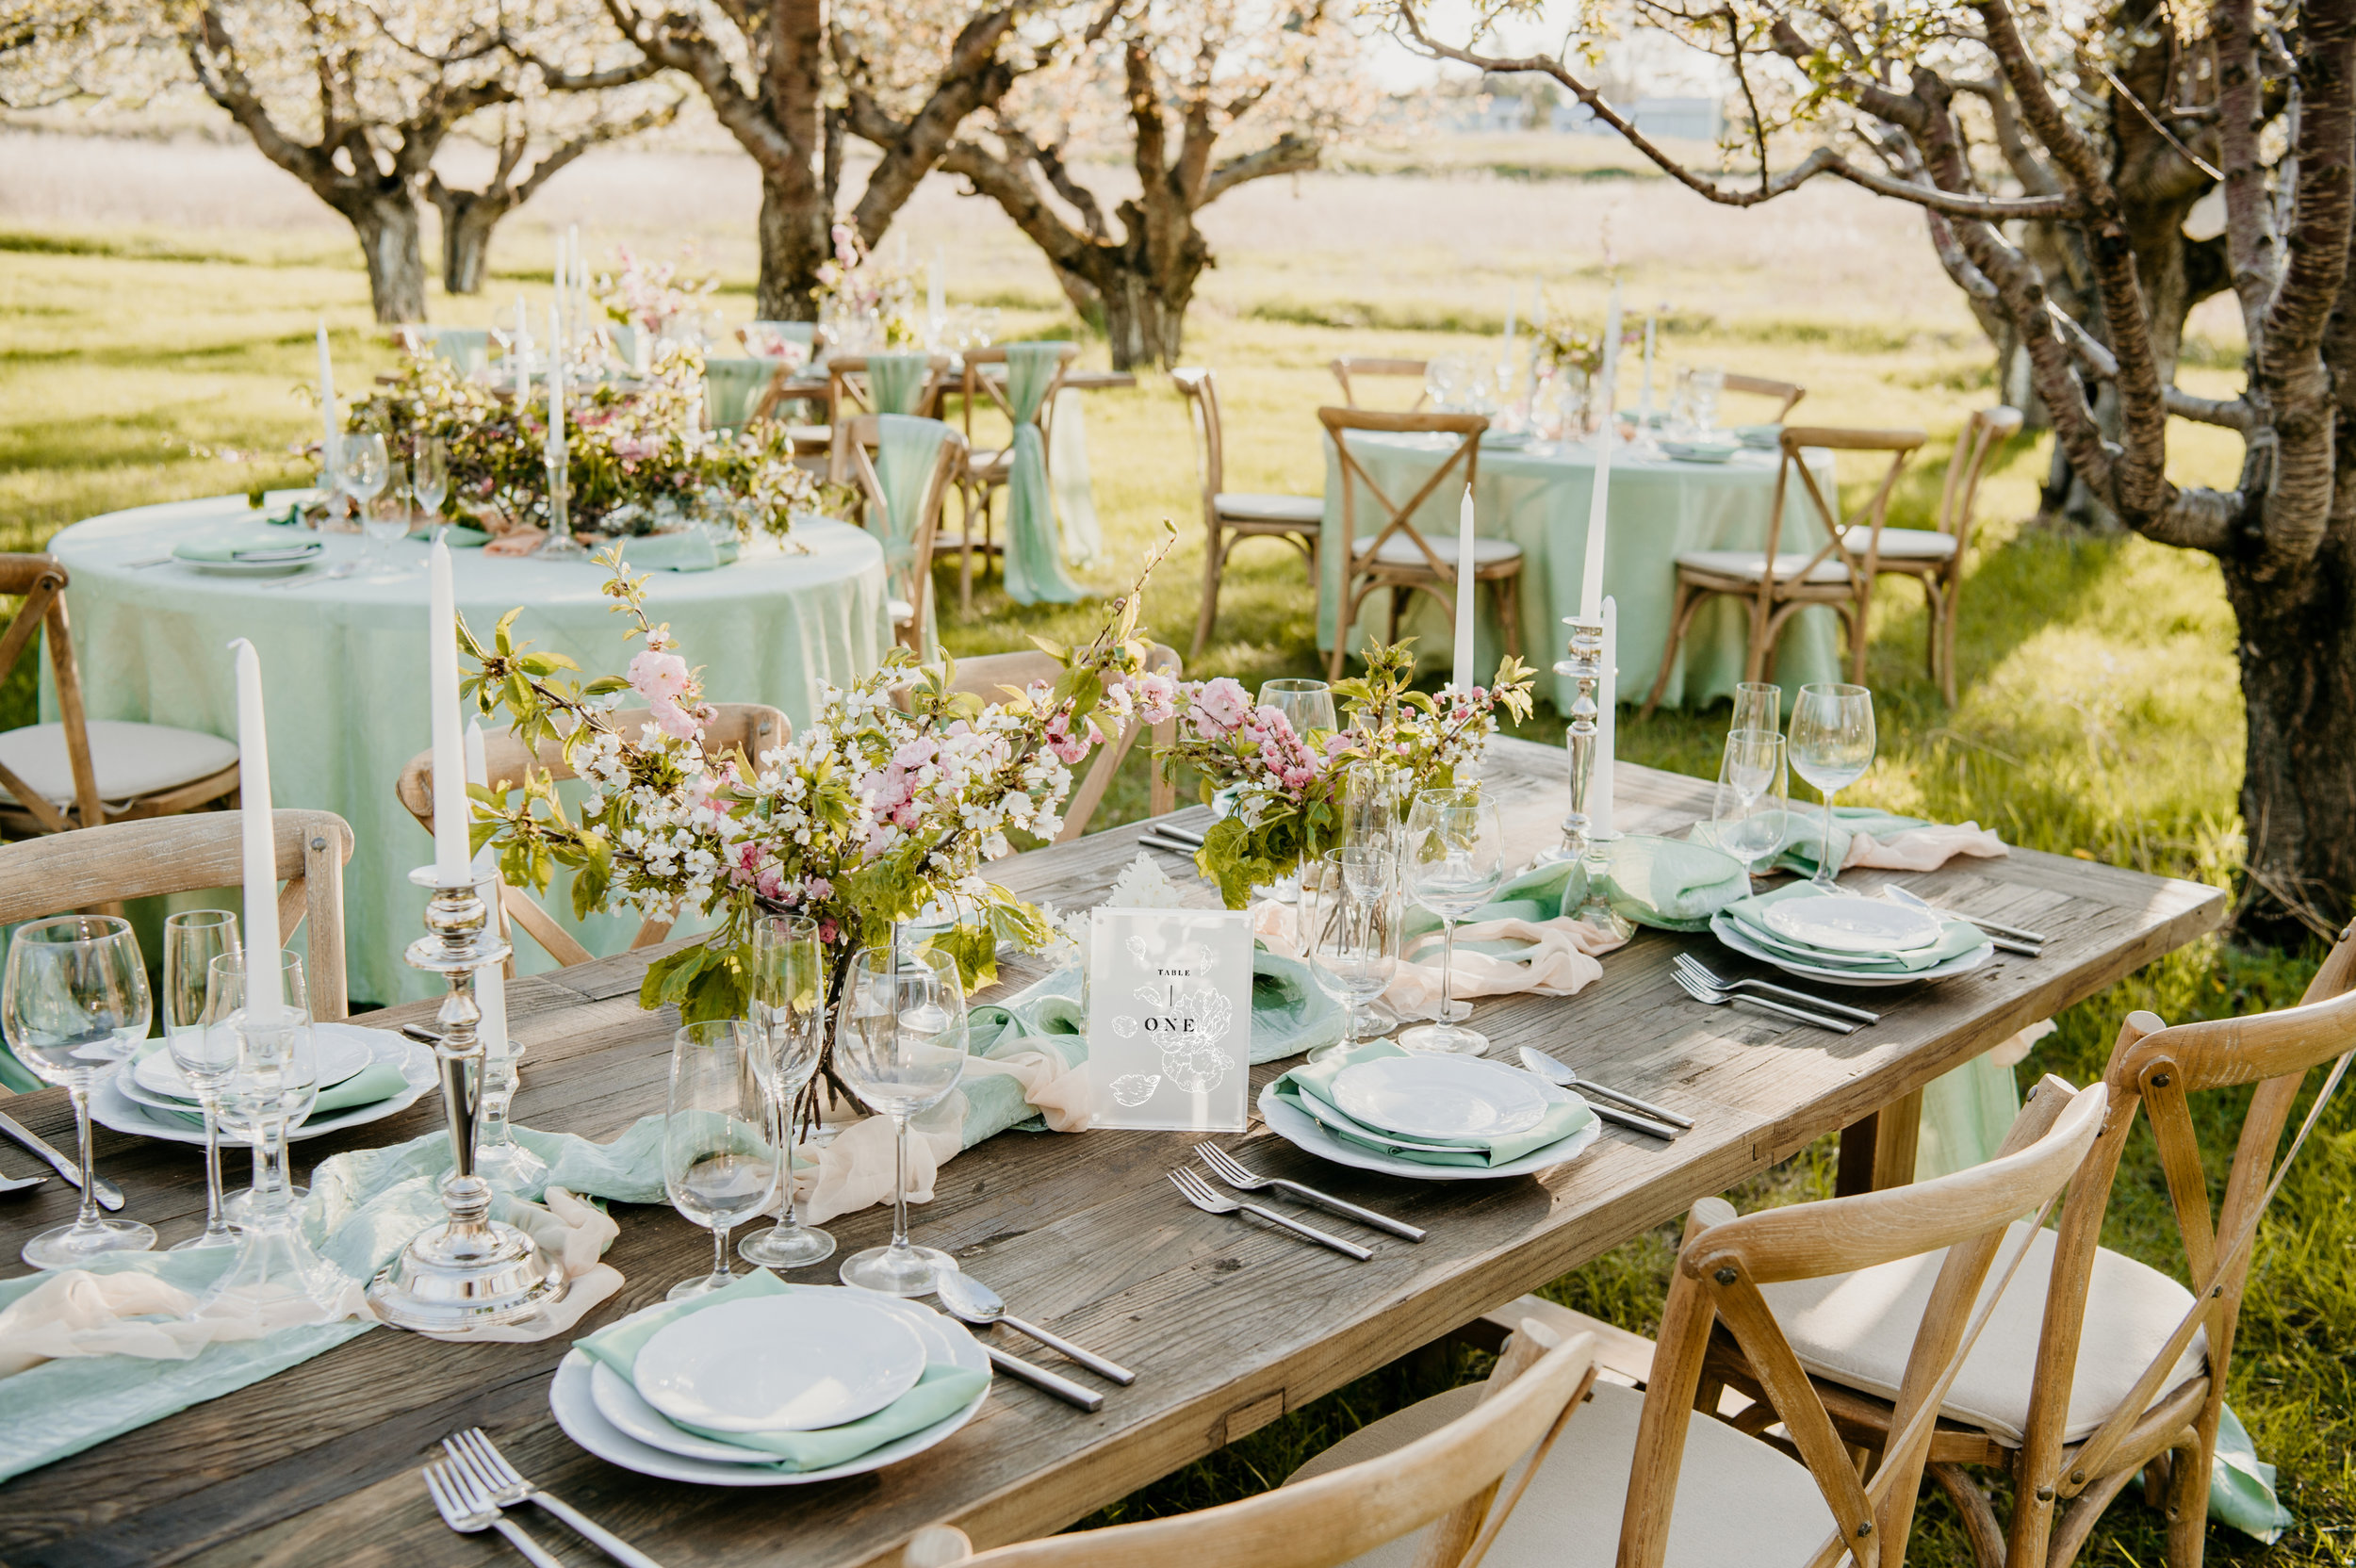 Cherry Blossom Wedding_Styled Photoshoot_Honeybee Weddings-113.jpg